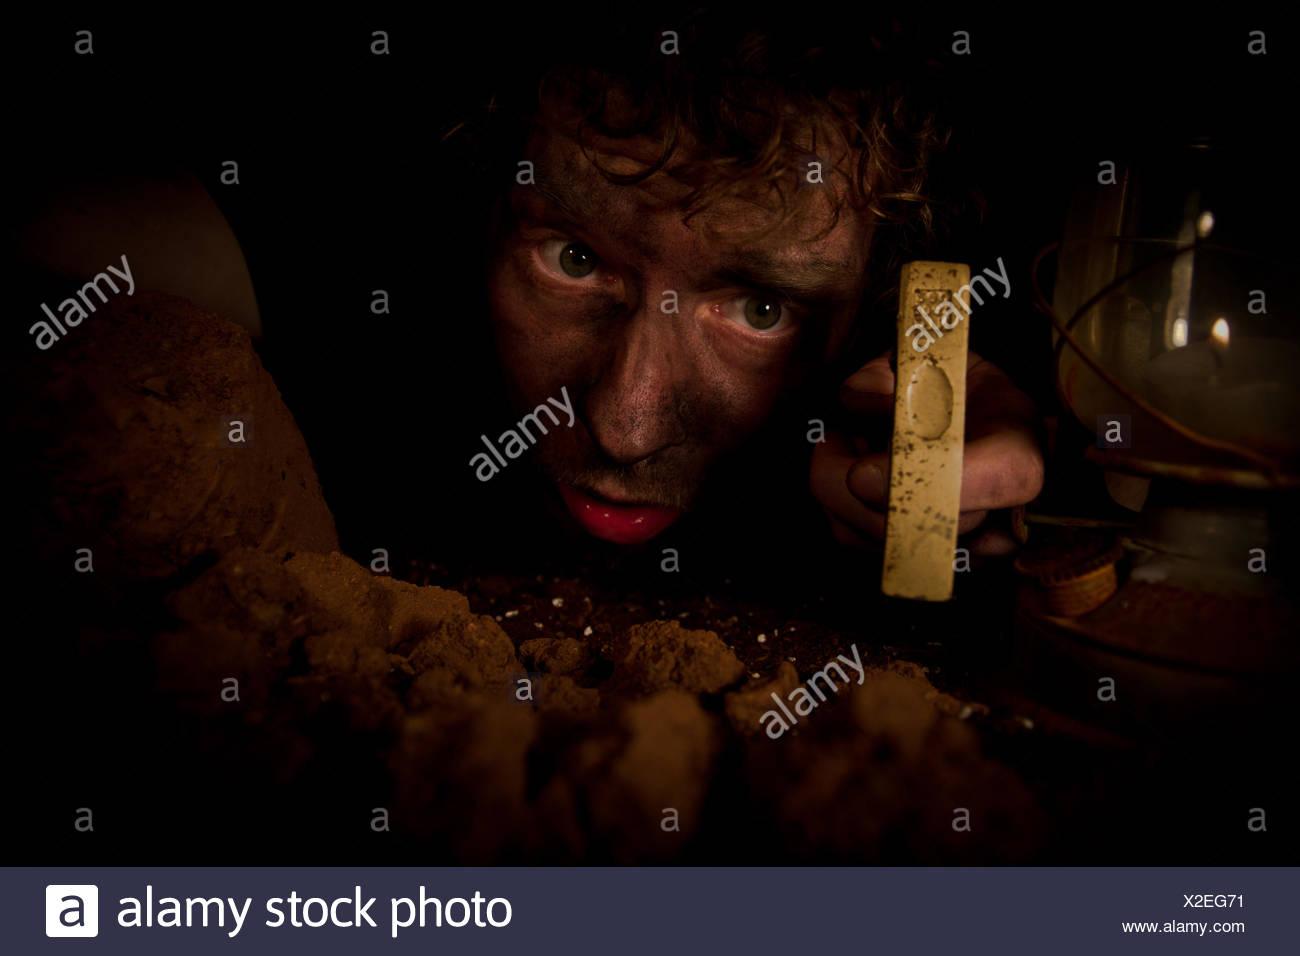 men man job - Stock Image